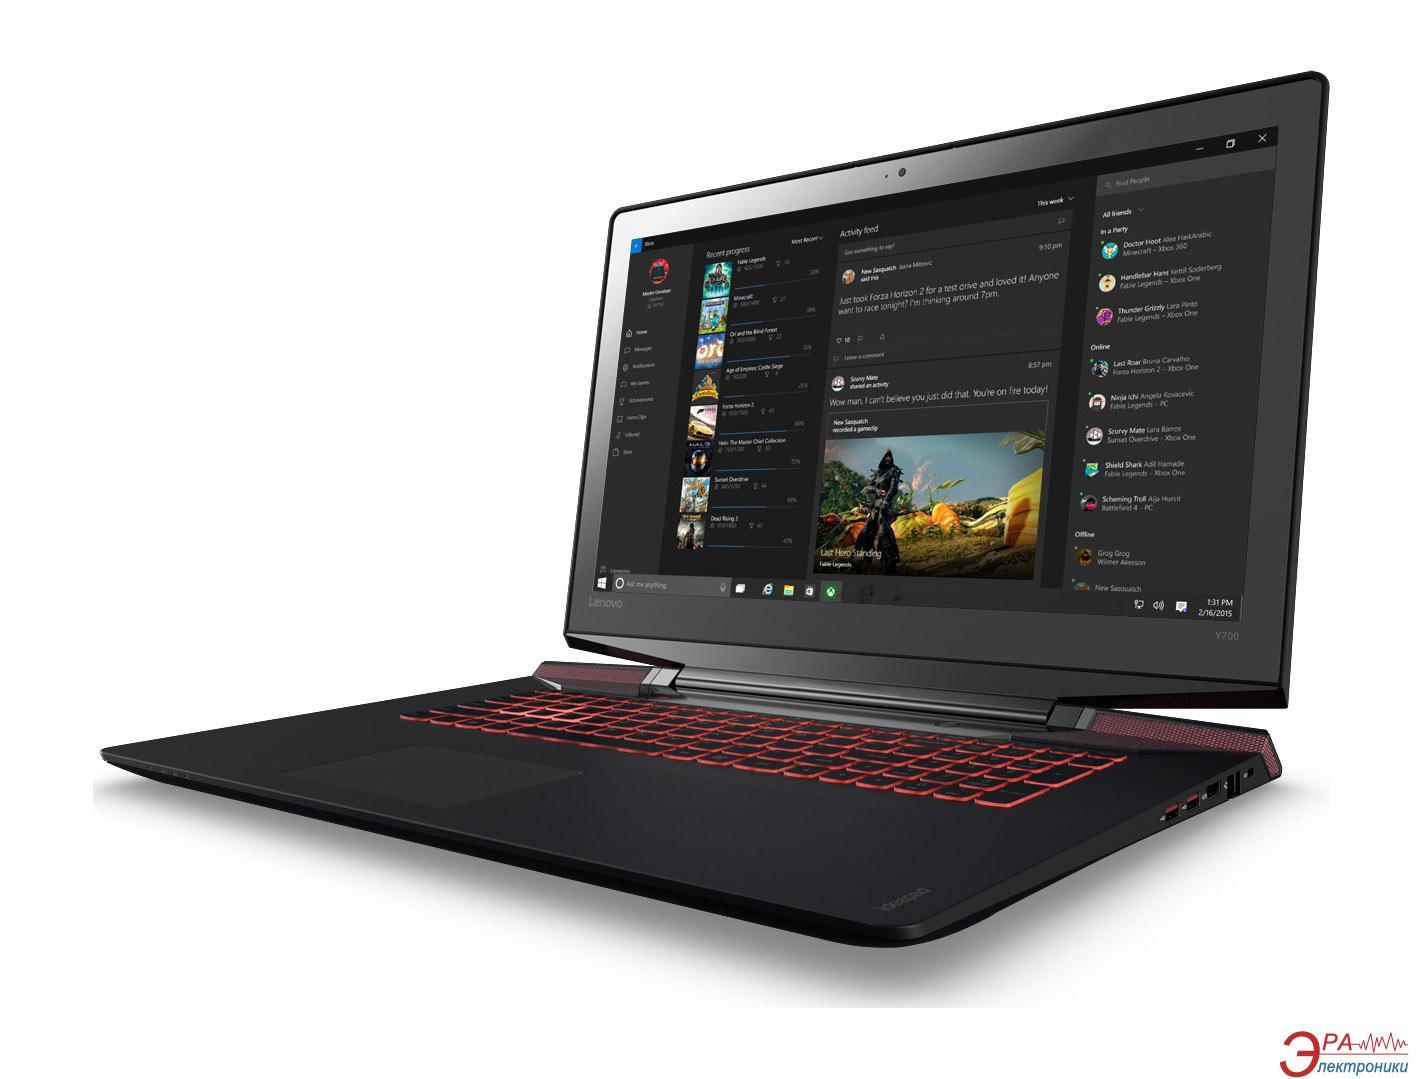 Ноутбук Lenovo IdeaPad Y700-17 (80Q00072UA) 17,3